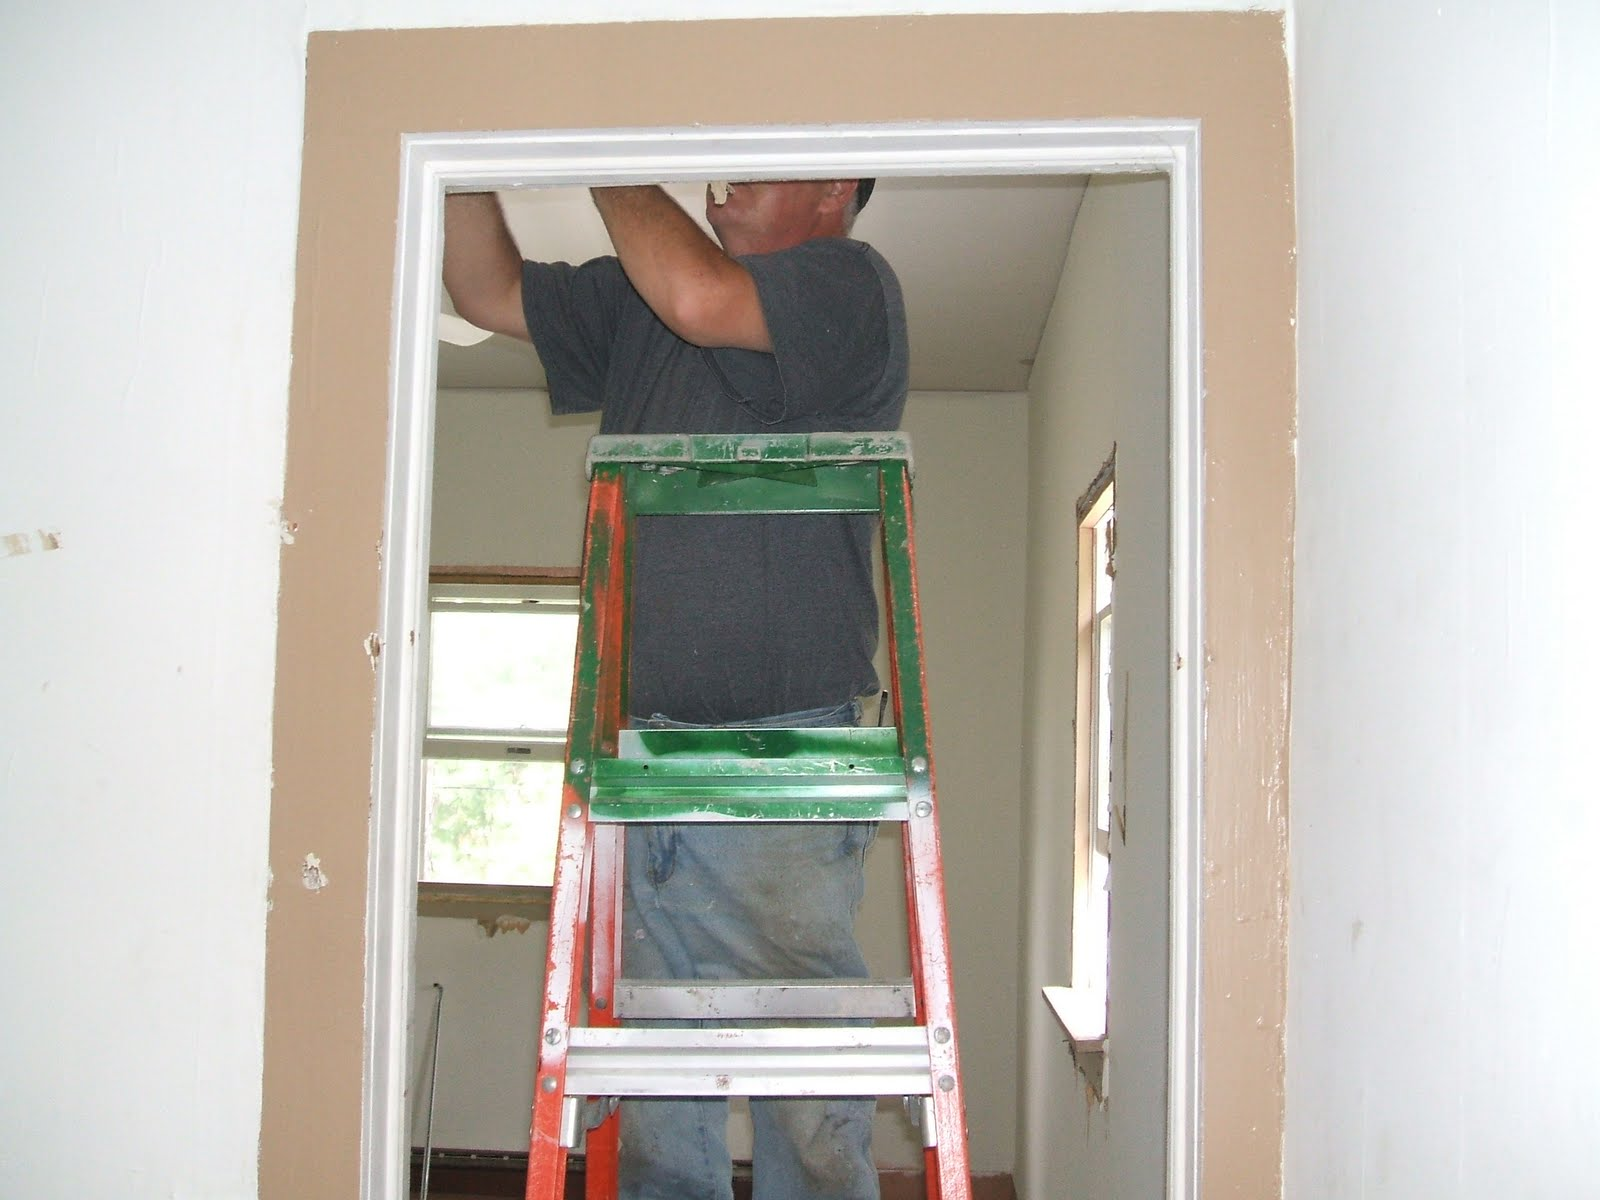 http://1.bp.blogspot.com/_kTkXC42XQPk/TIjf7-BrzaI/AAAAAAAAAq0/S6_YdxhgUSA/s1600/Home+Remodeling+Project++-+Spare+Room+Wallpaper+Remove+Trim.JPG